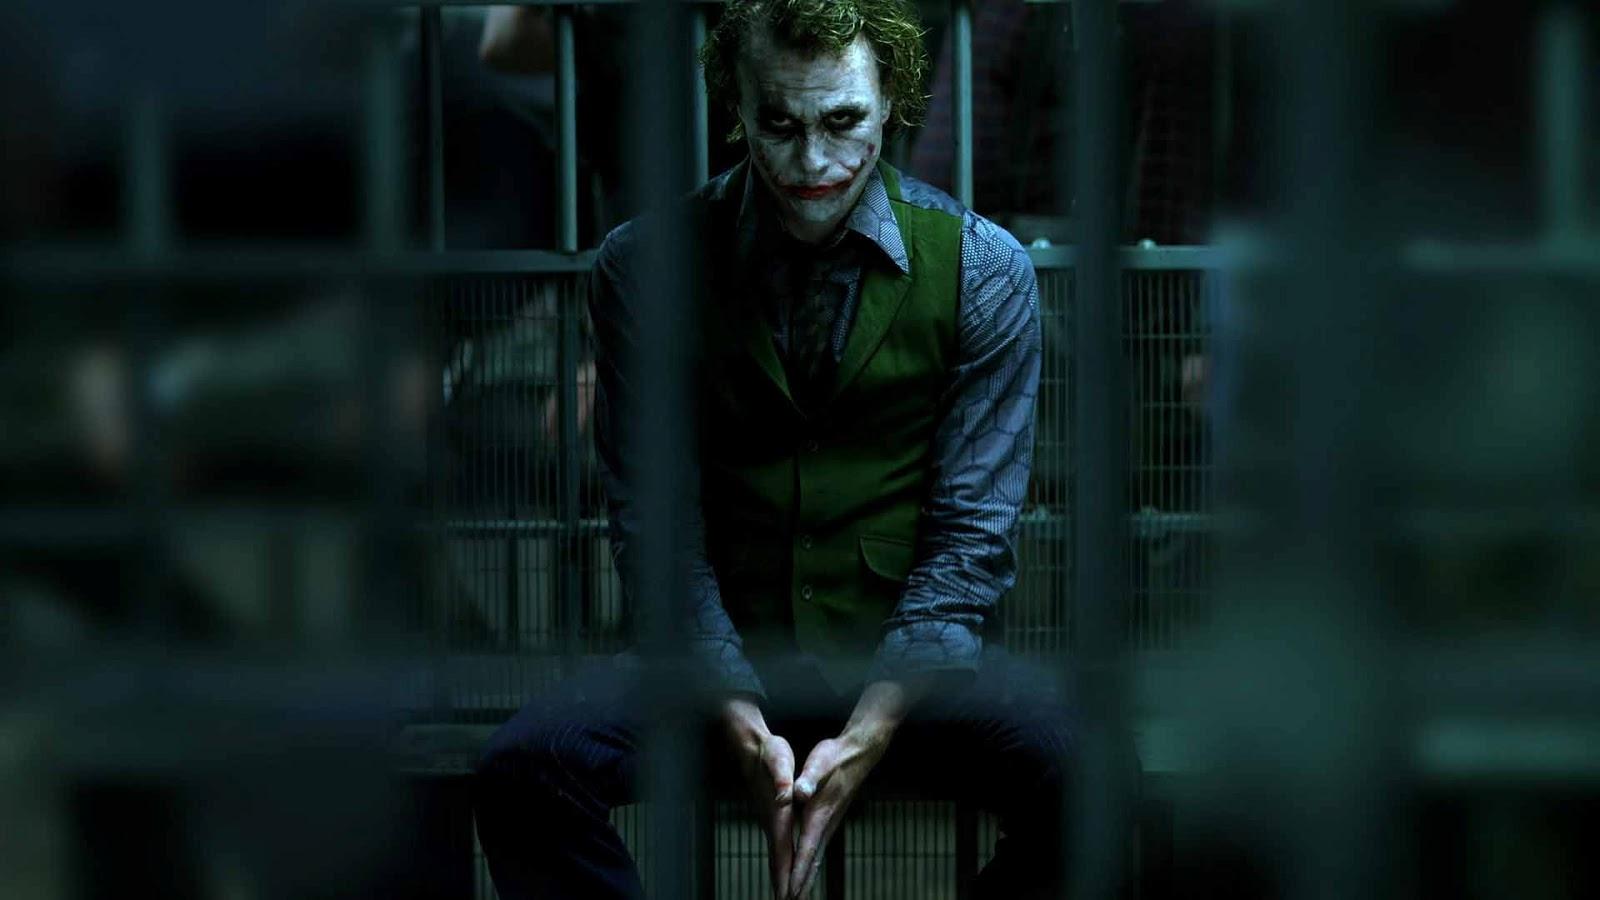 Joker HD Wallpapers C a r W a l l p a p e r 2014 1600x900